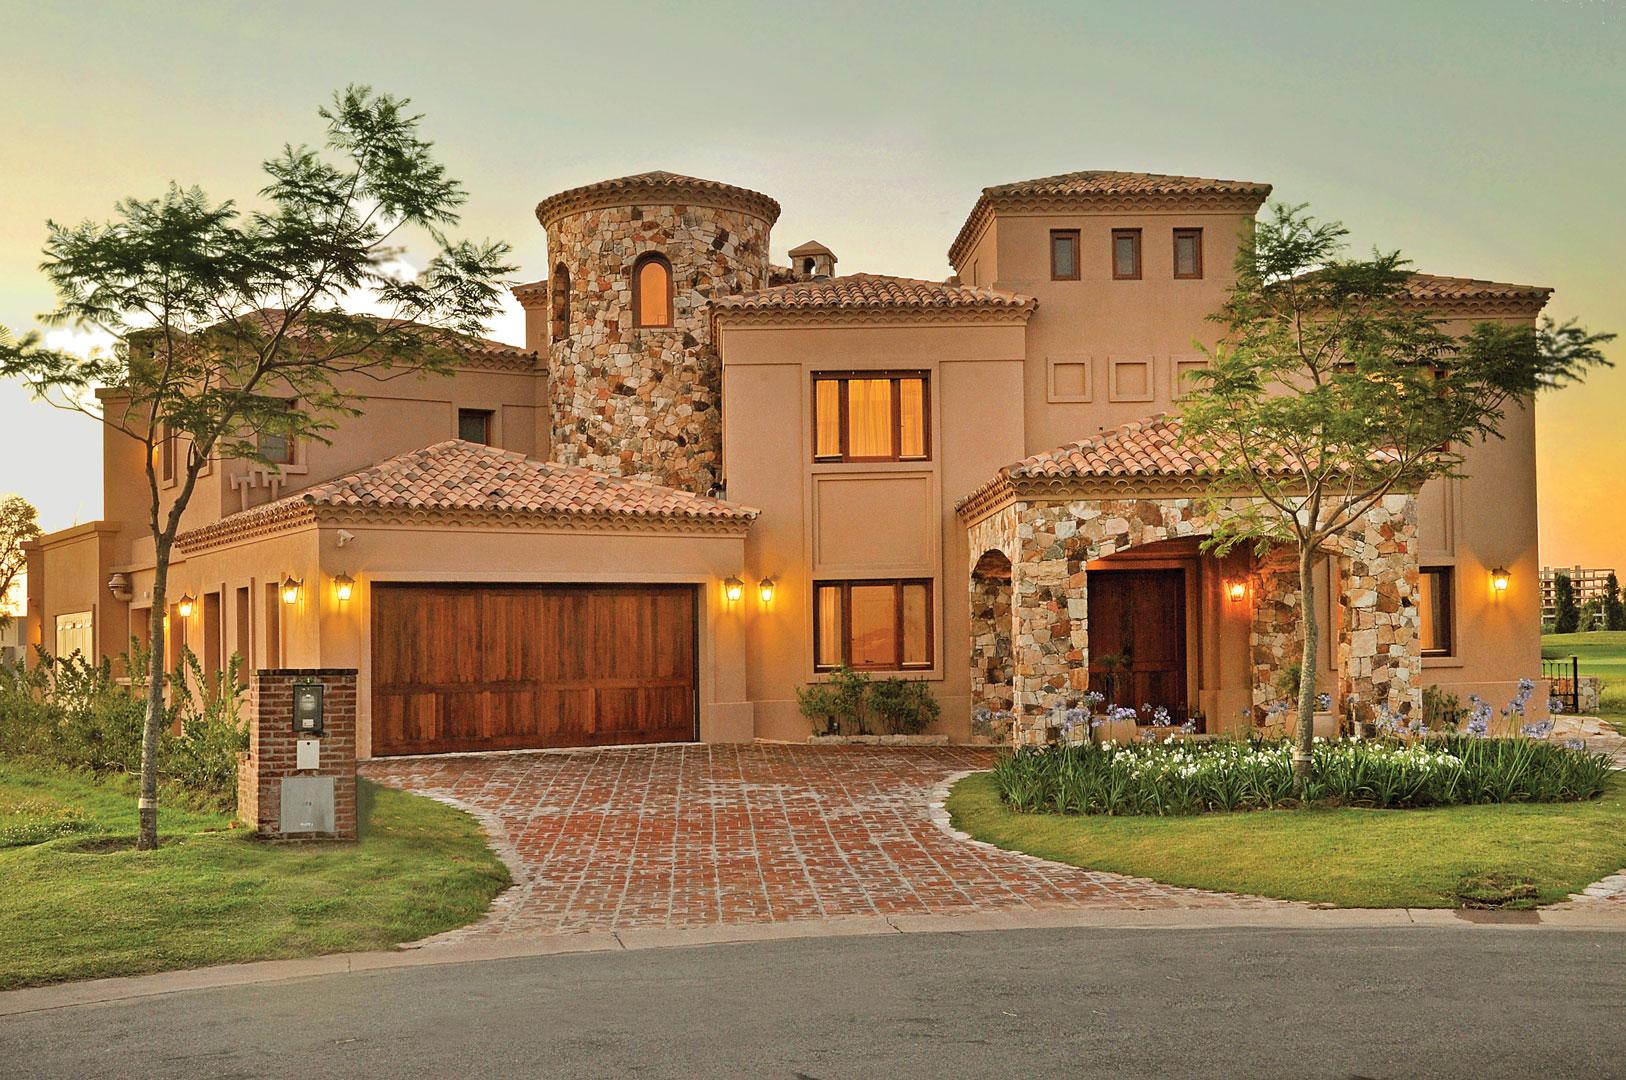 Apa arquitectura casa estilo cl sico toscano for Casas de diseno santa fe